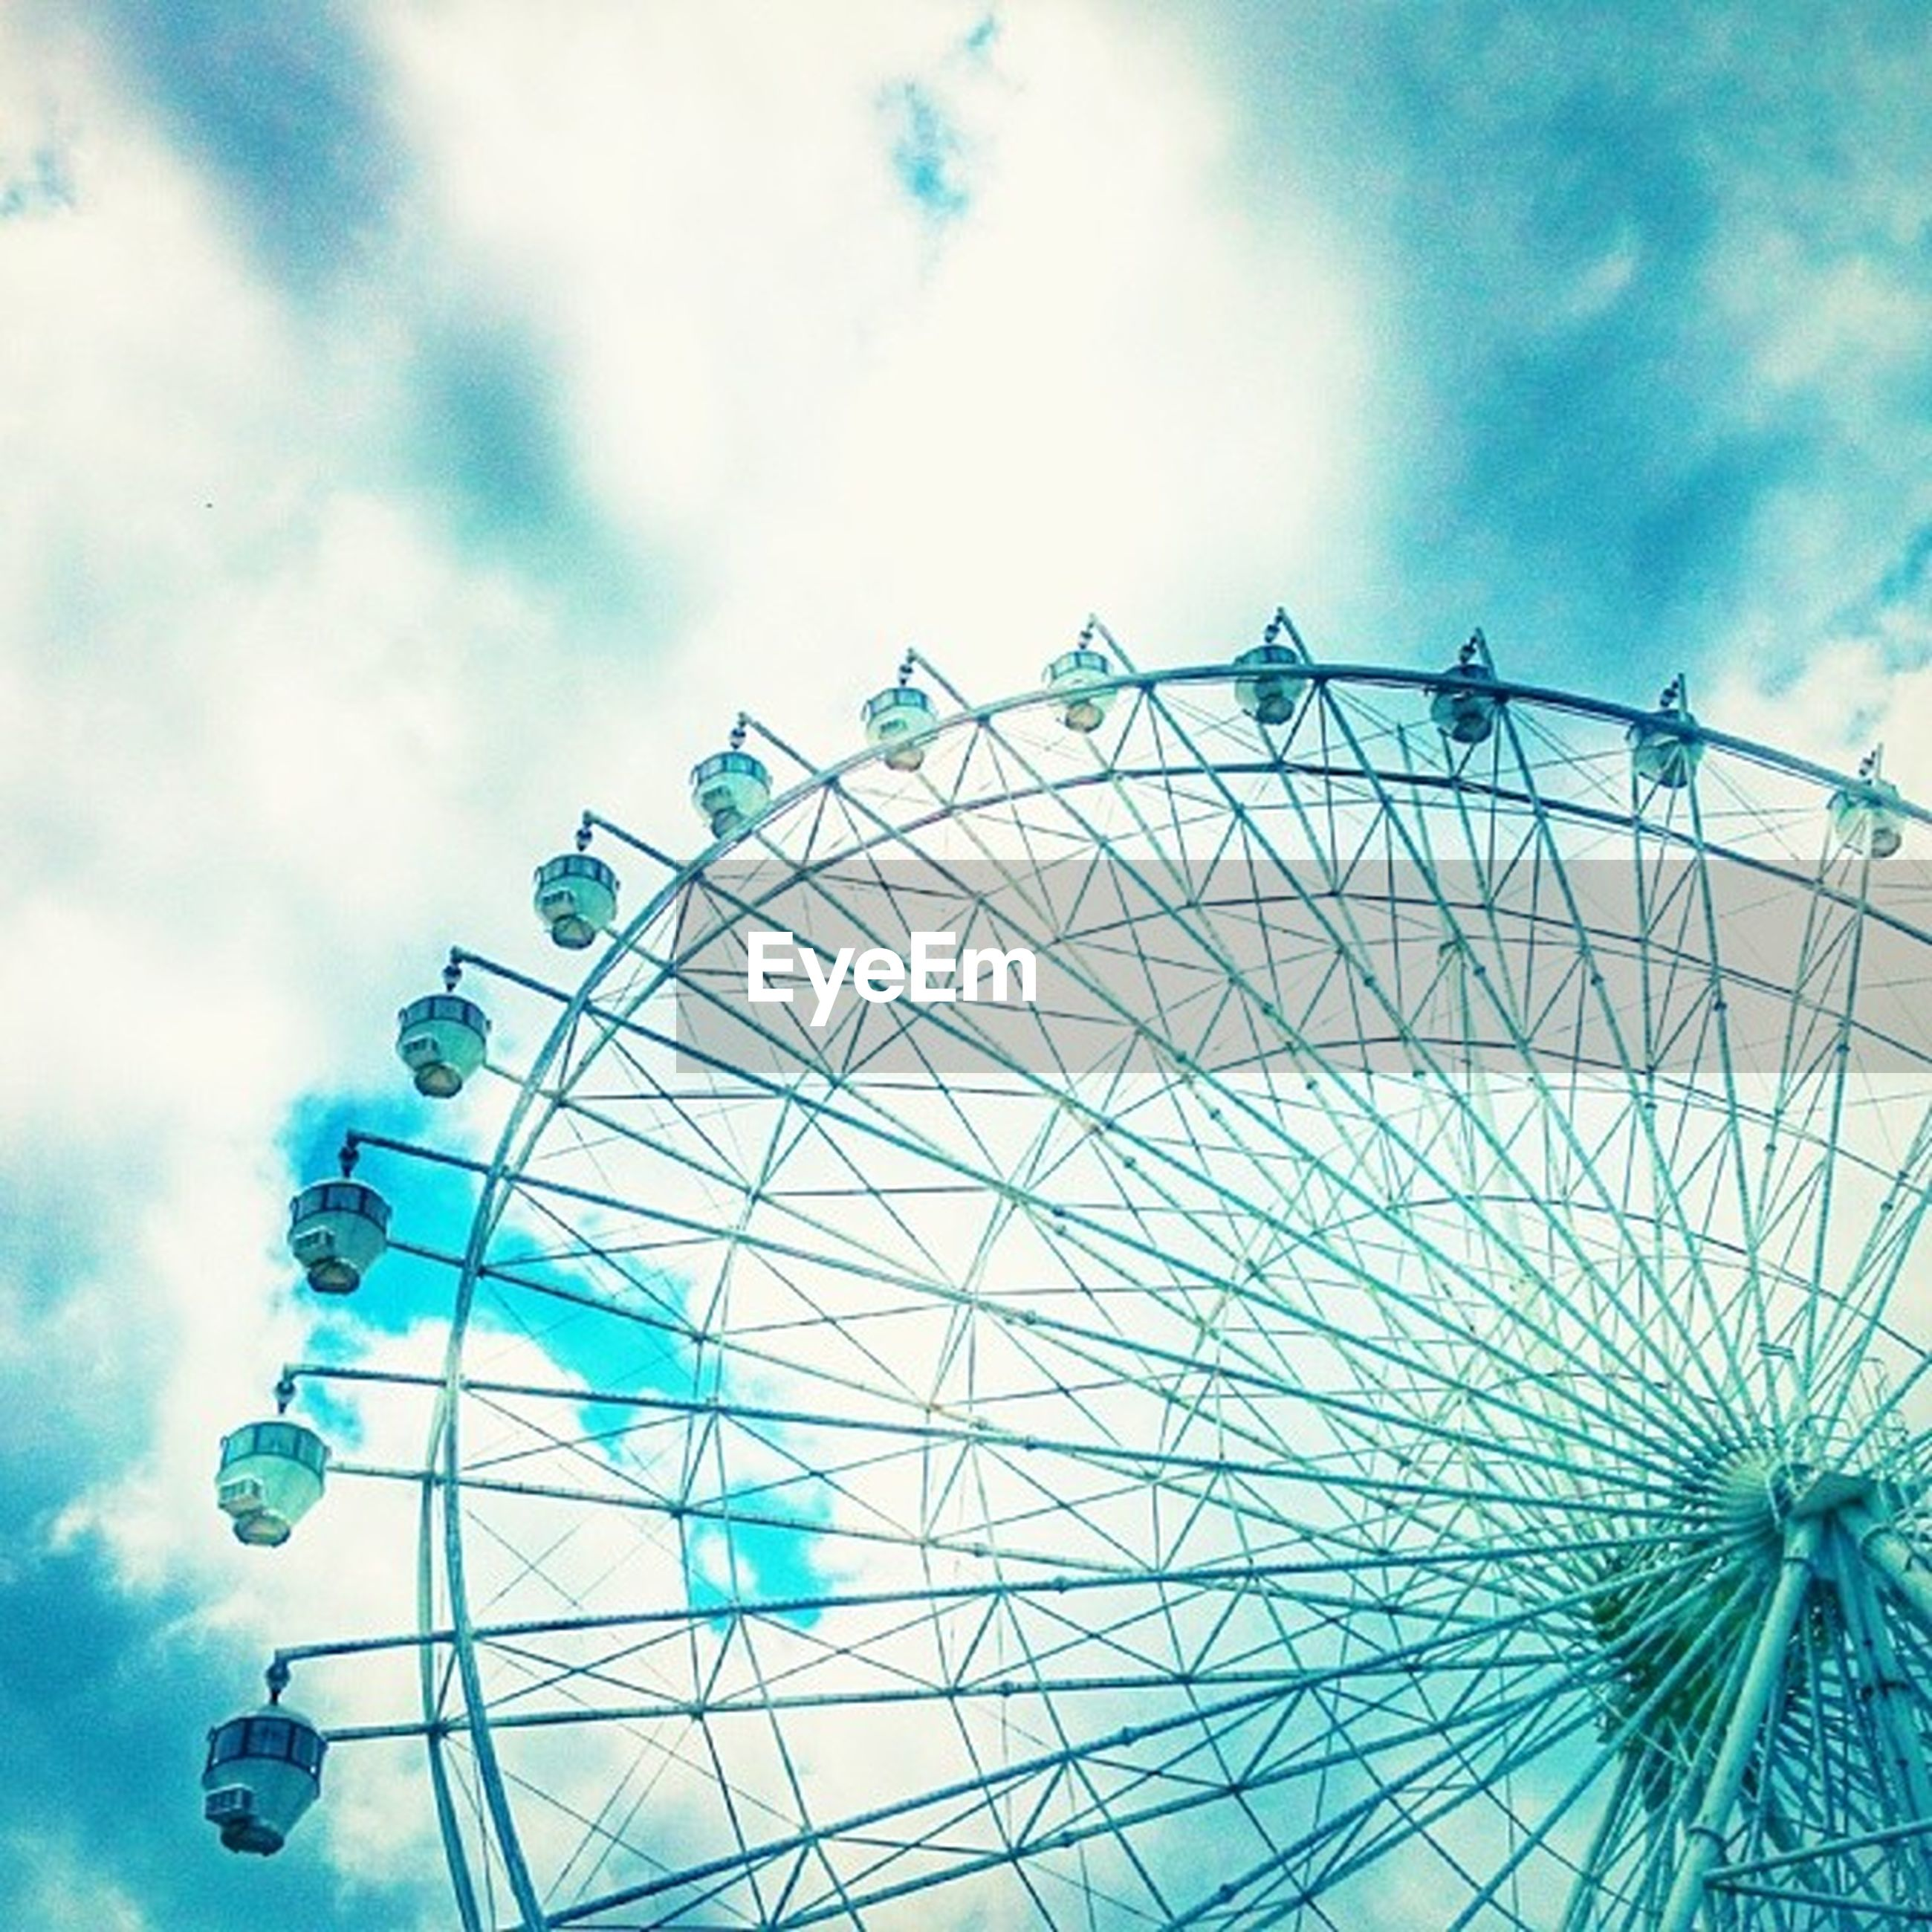 low angle view, amusement park, sky, amusement park ride, ferris wheel, arts culture and entertainment, cloud - sky, pattern, blue, cloudy, design, cloud, metal, day, built structure, fun, circle, no people, decoration, outdoors